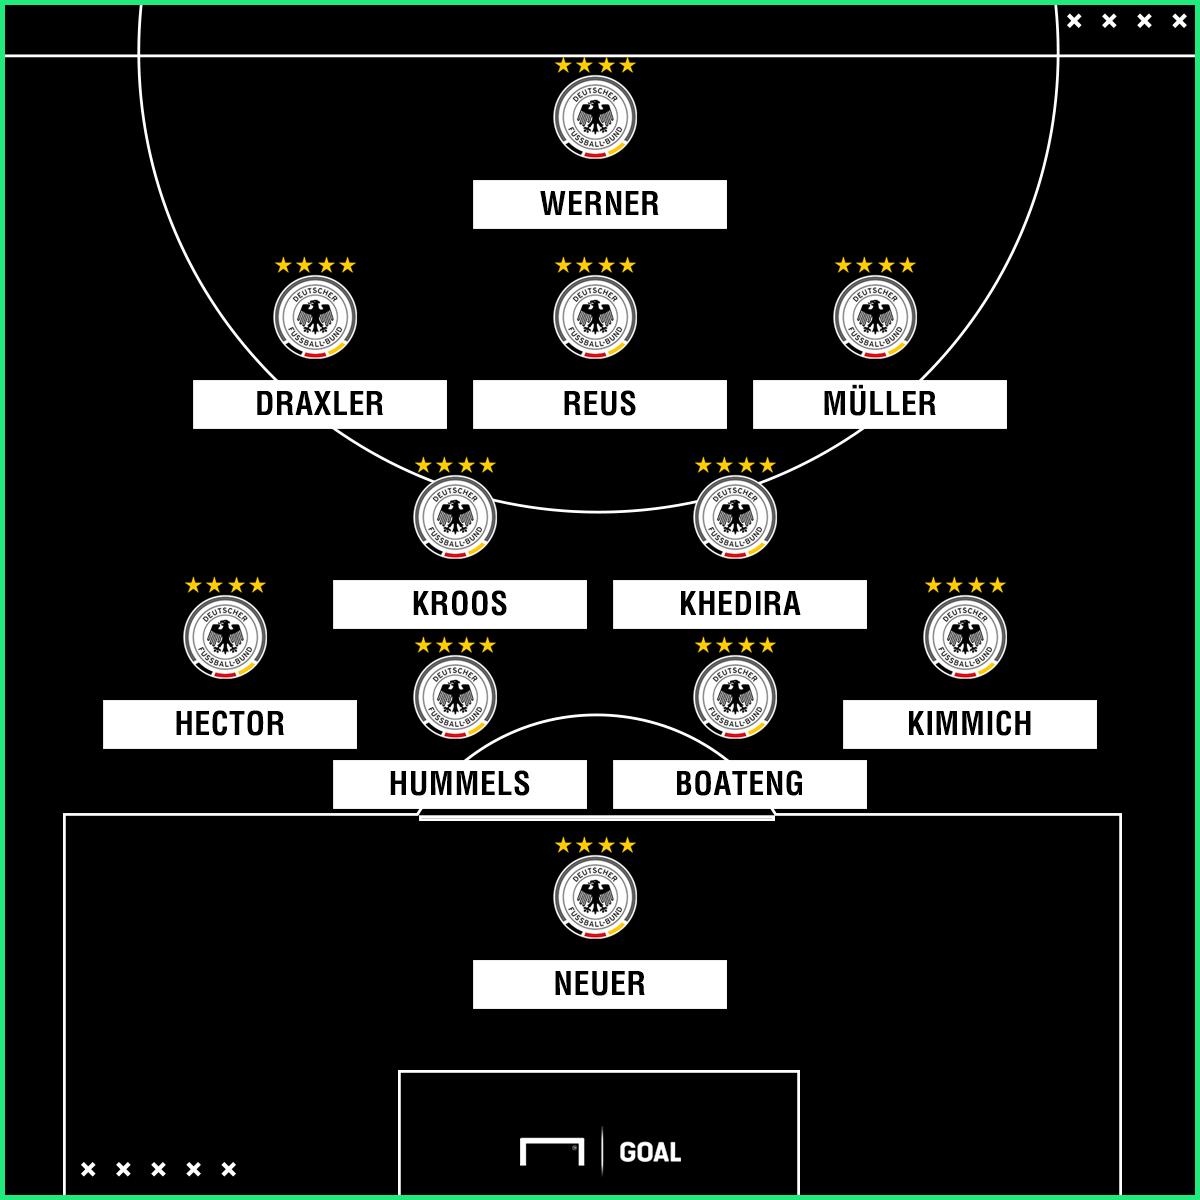 Sorge um Mesut Özil: Verpasst DFB-Star den WM-Auftakt?